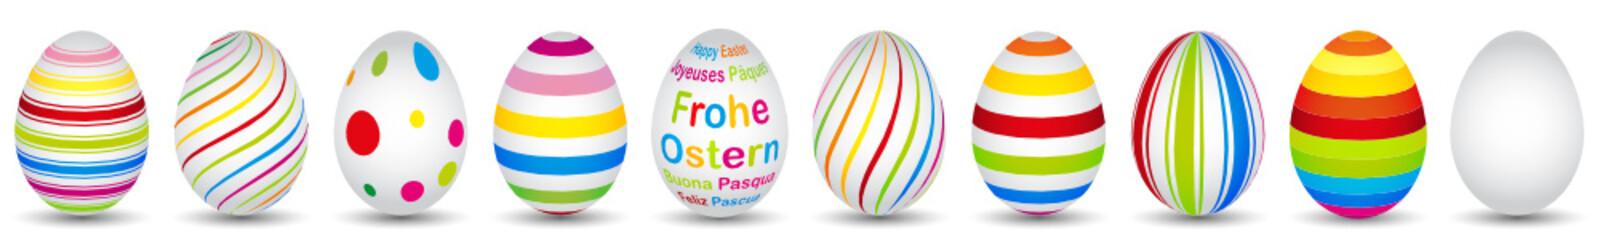 10 colourful easter eggs in modern design